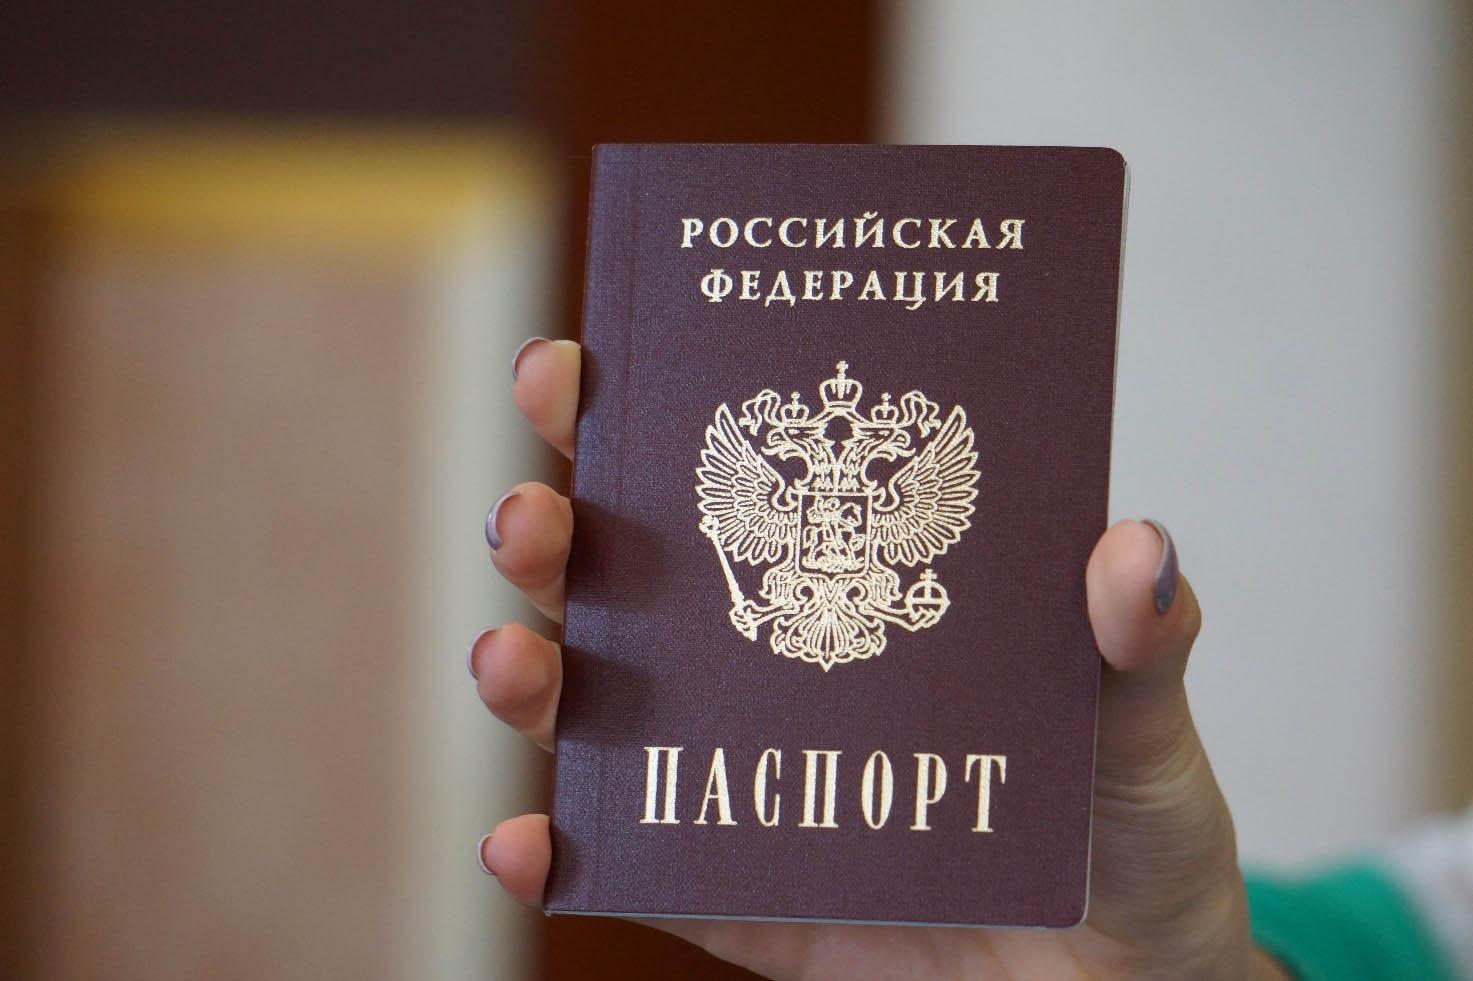 Билайн устроил своим абонентам перекличку с паспортами